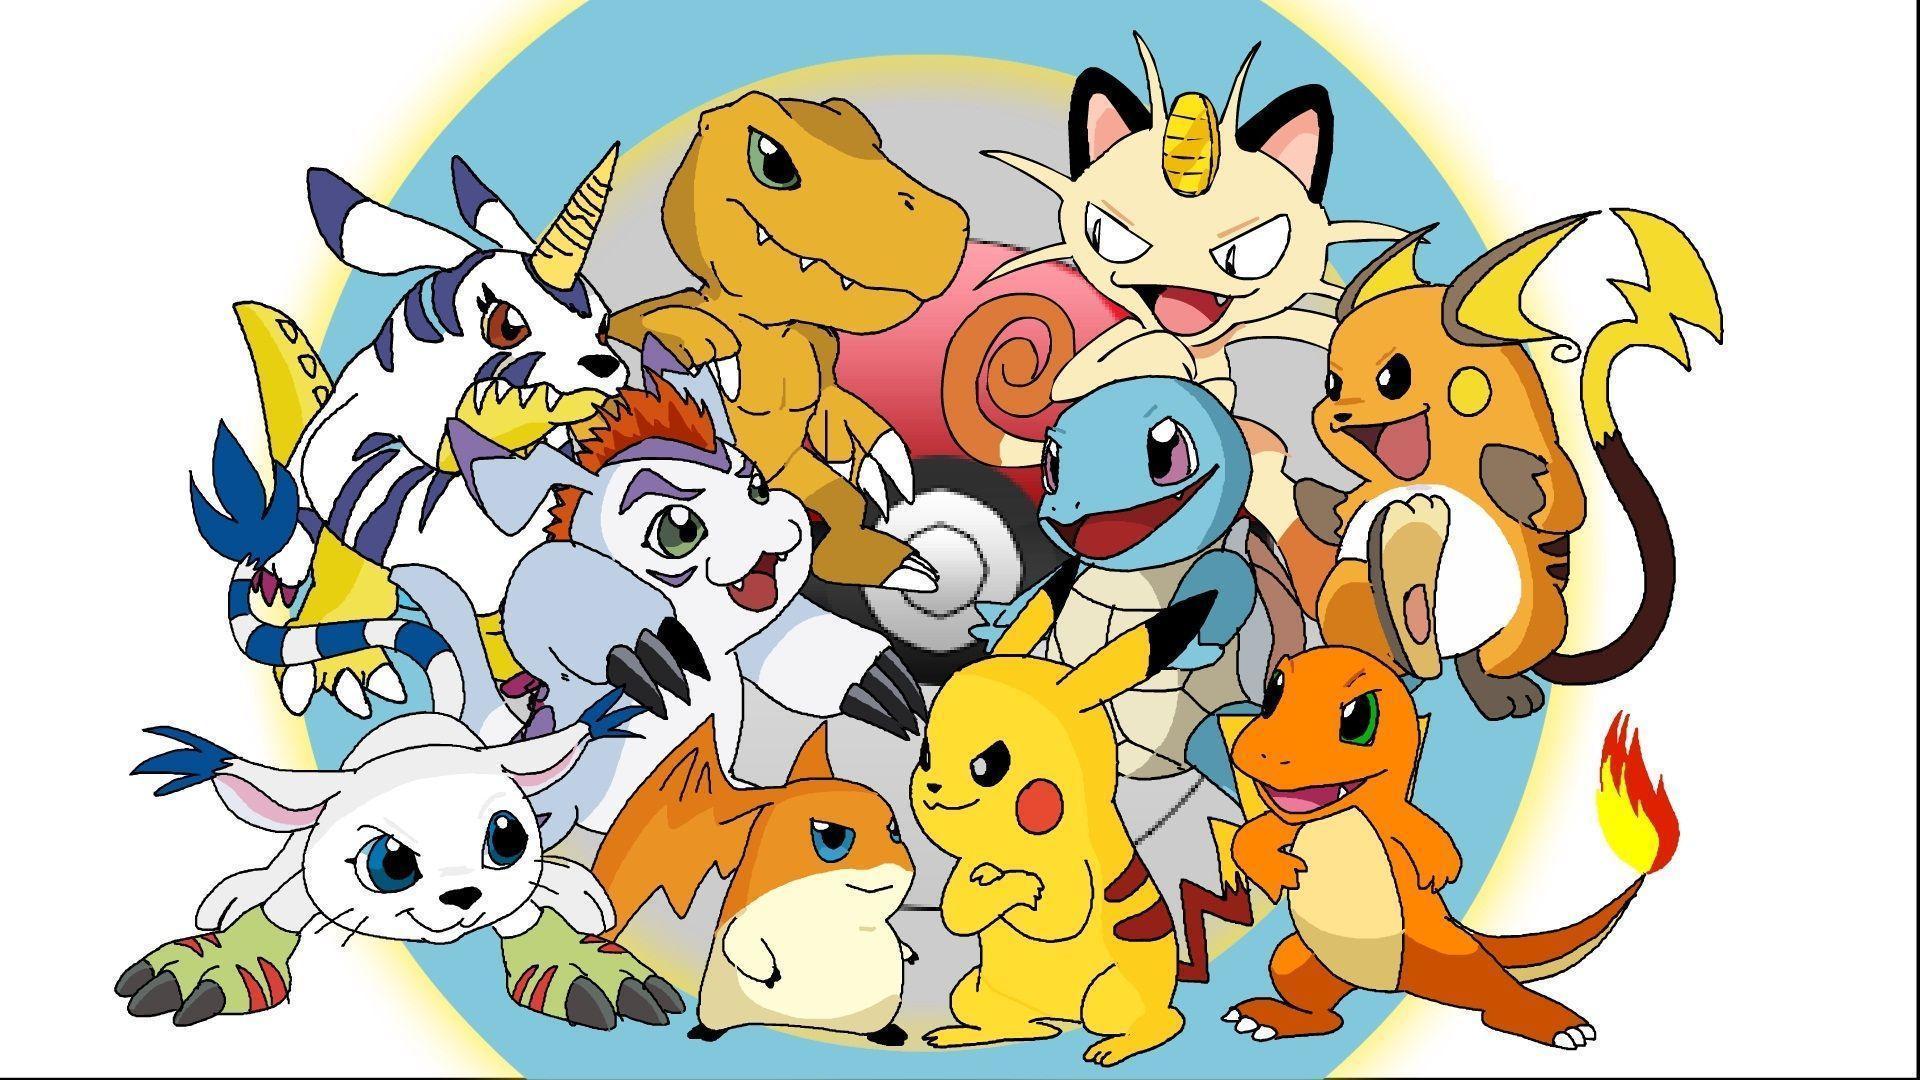 Wallpapers For Cute Pokemon Wallpaper Tumblr